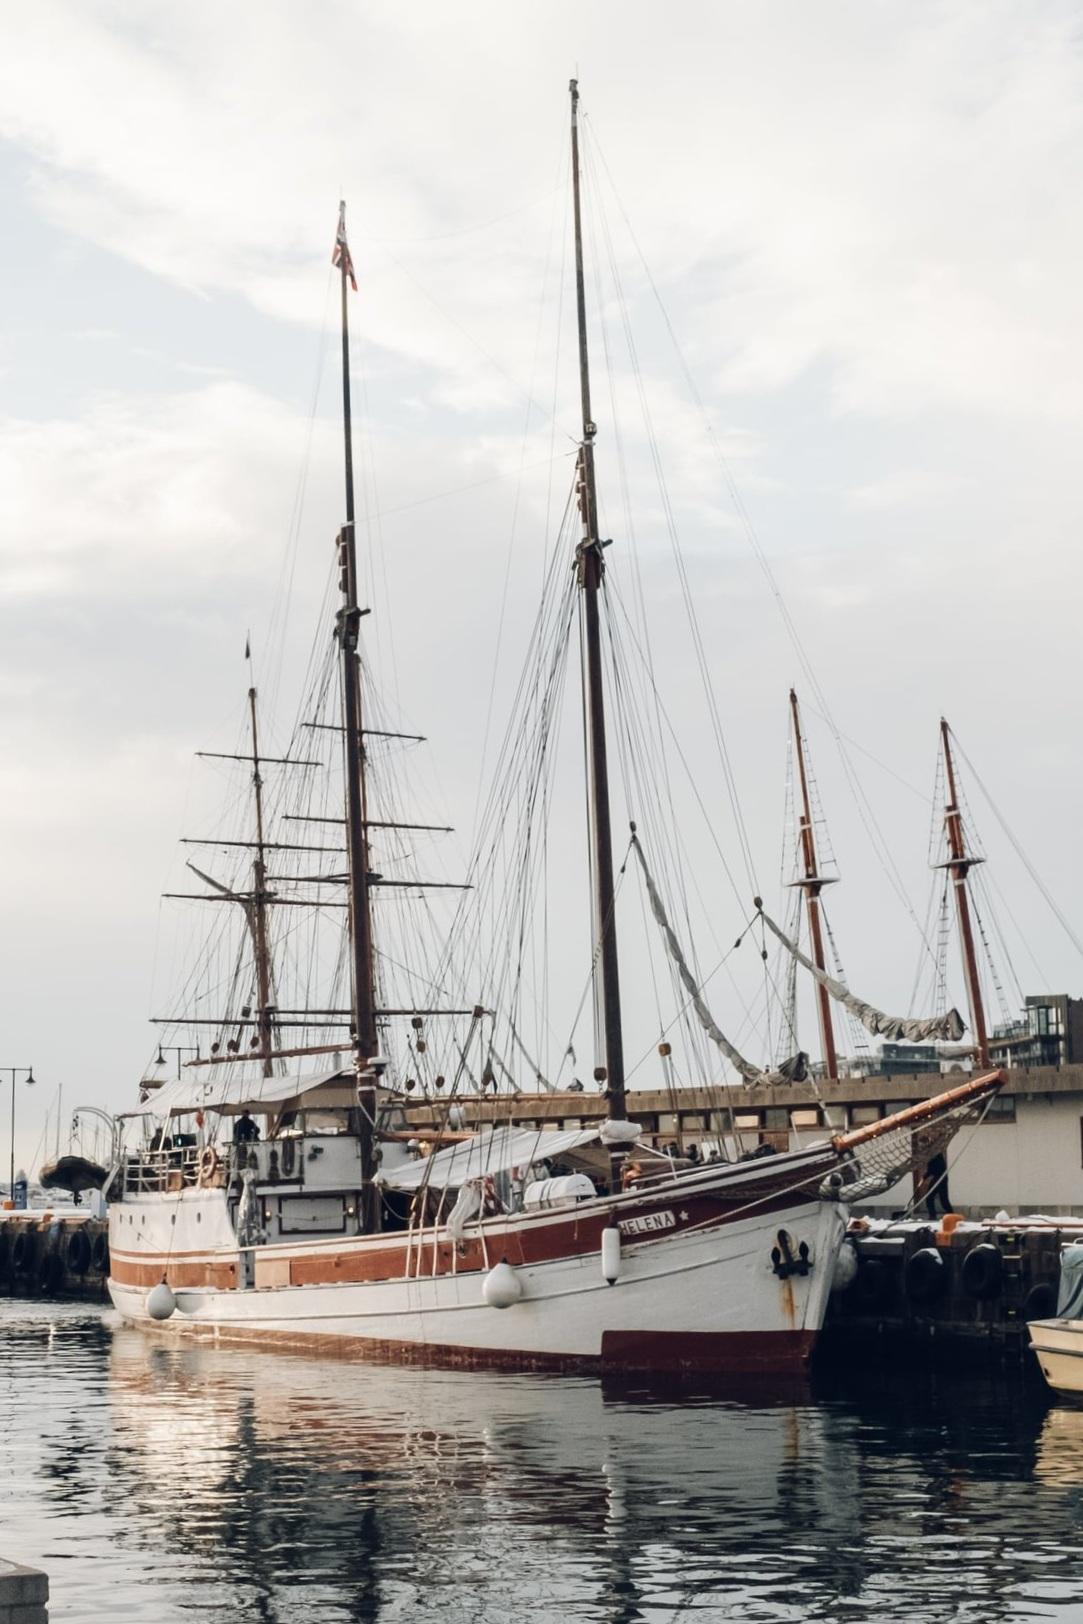 Oslo Fjord Cruise in Winter - by Haarkon